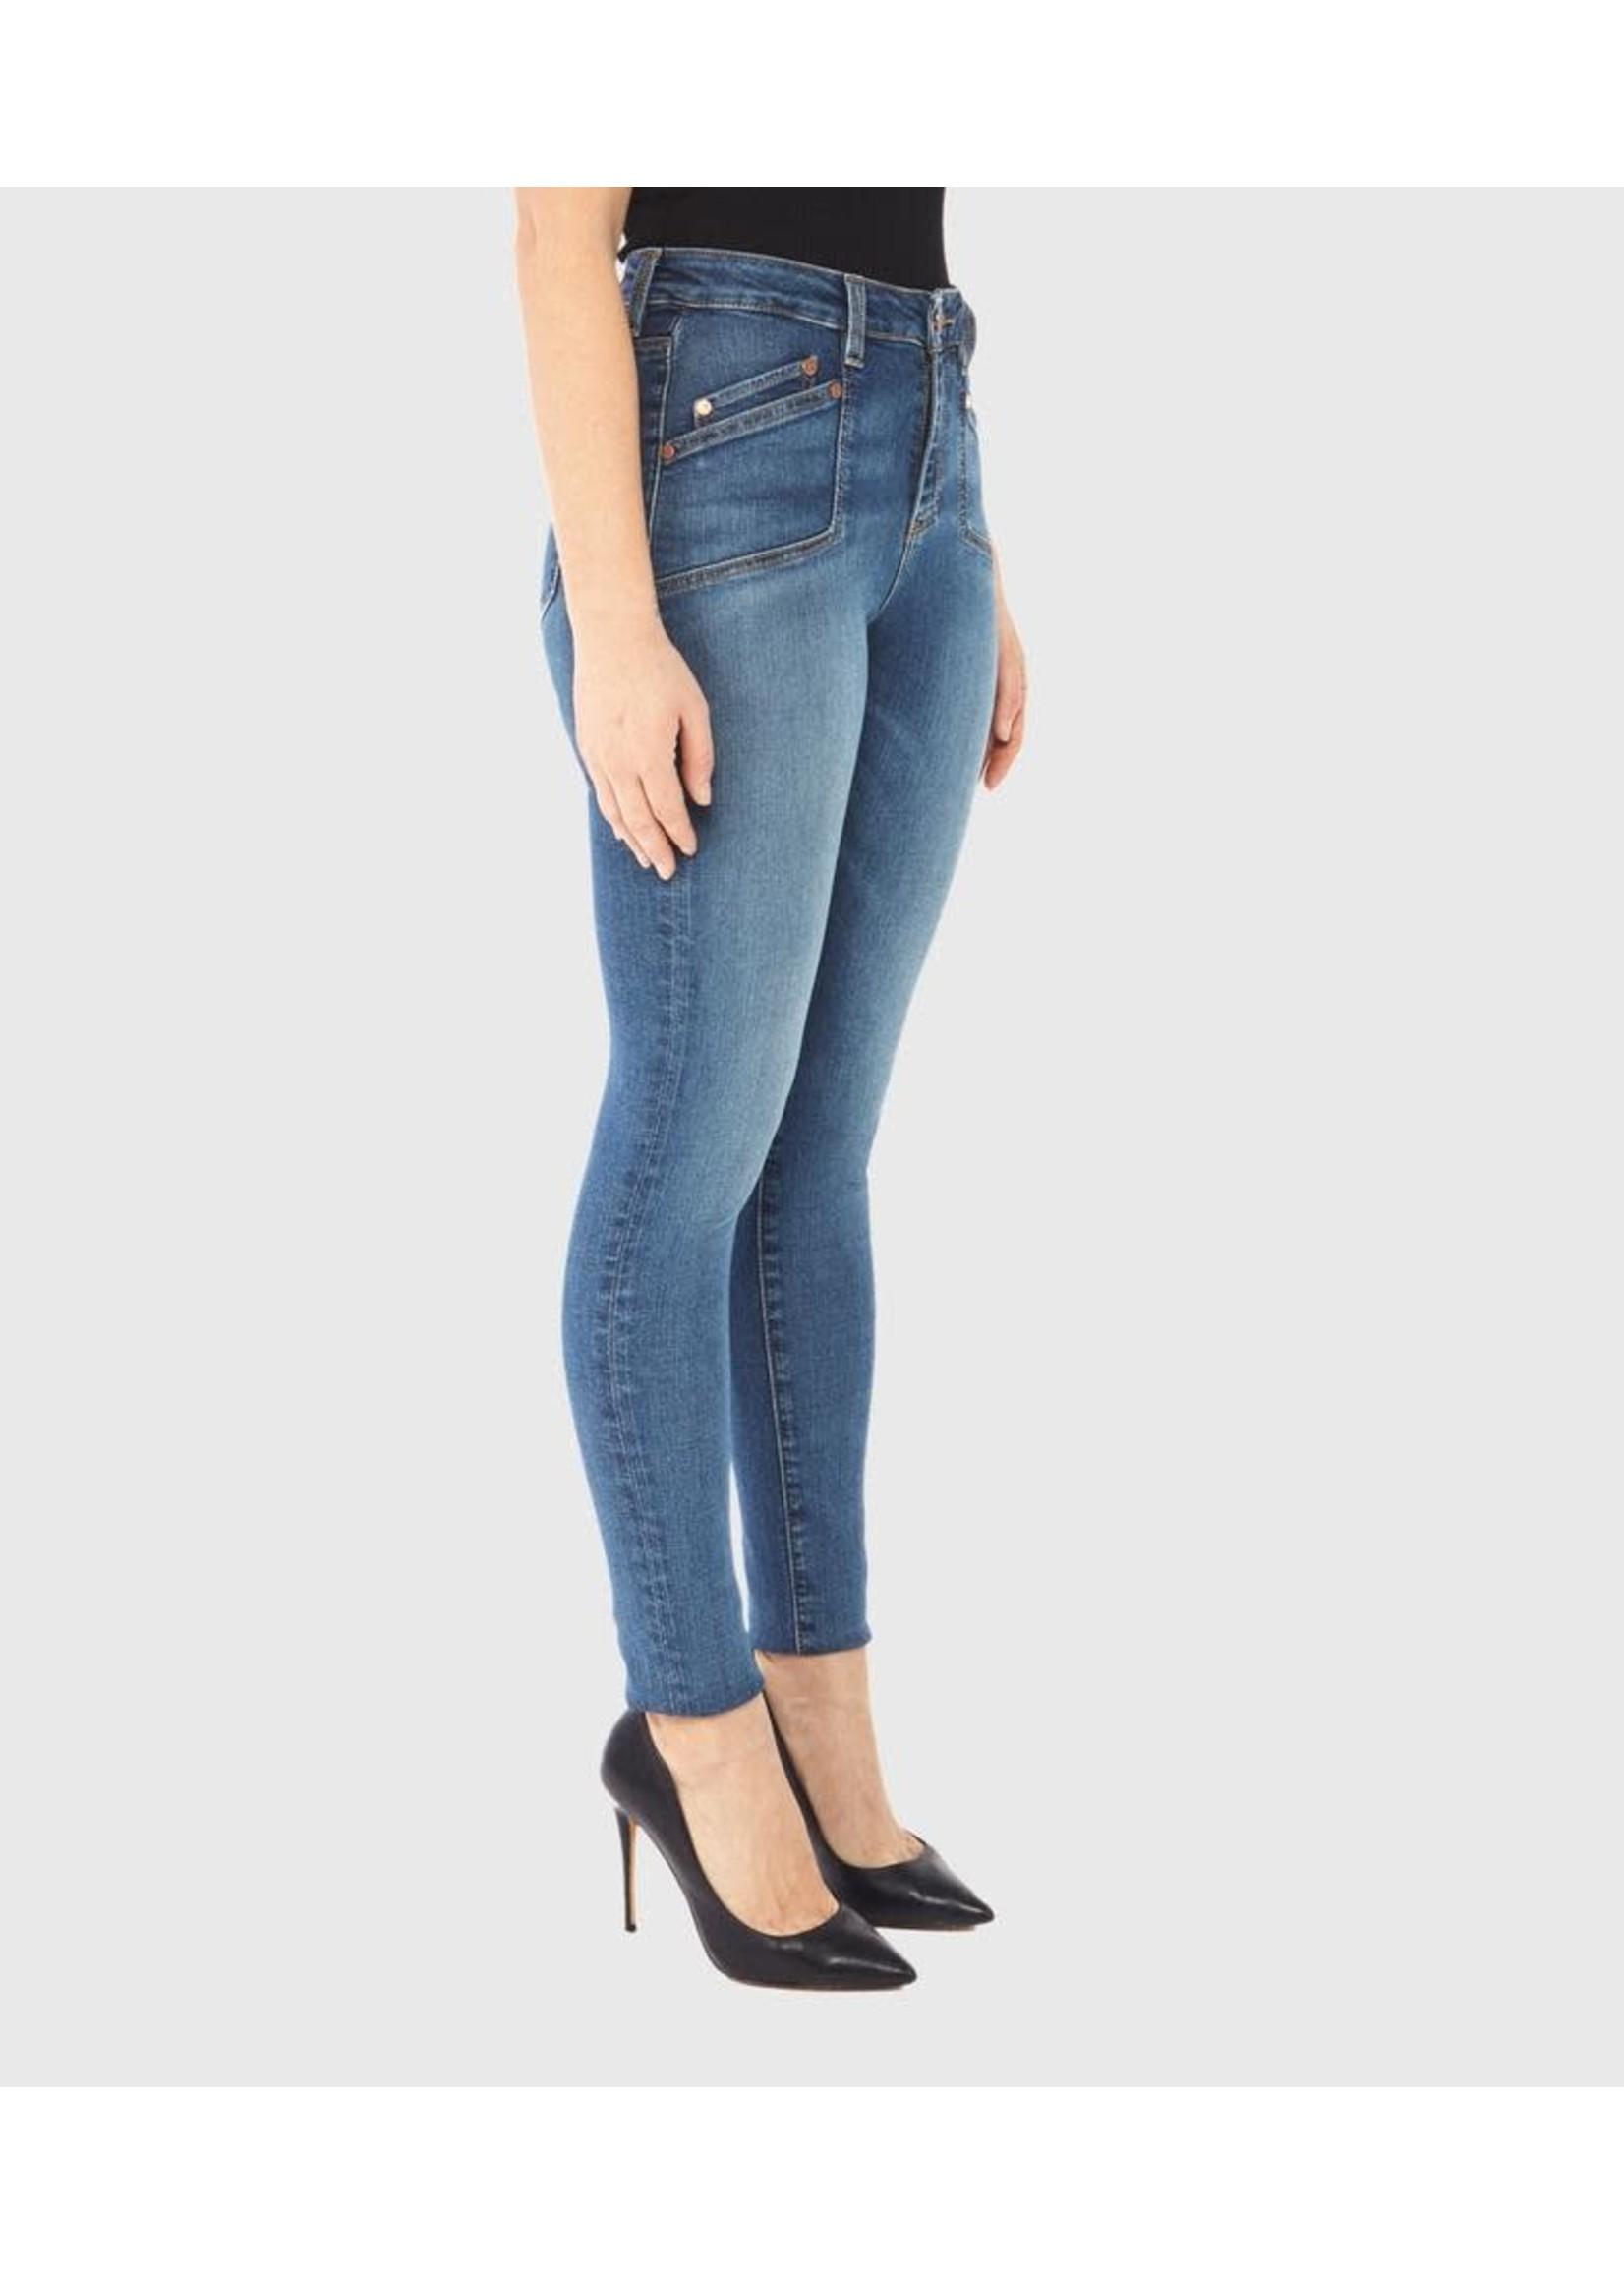 Lola Jeans Alexa Jean